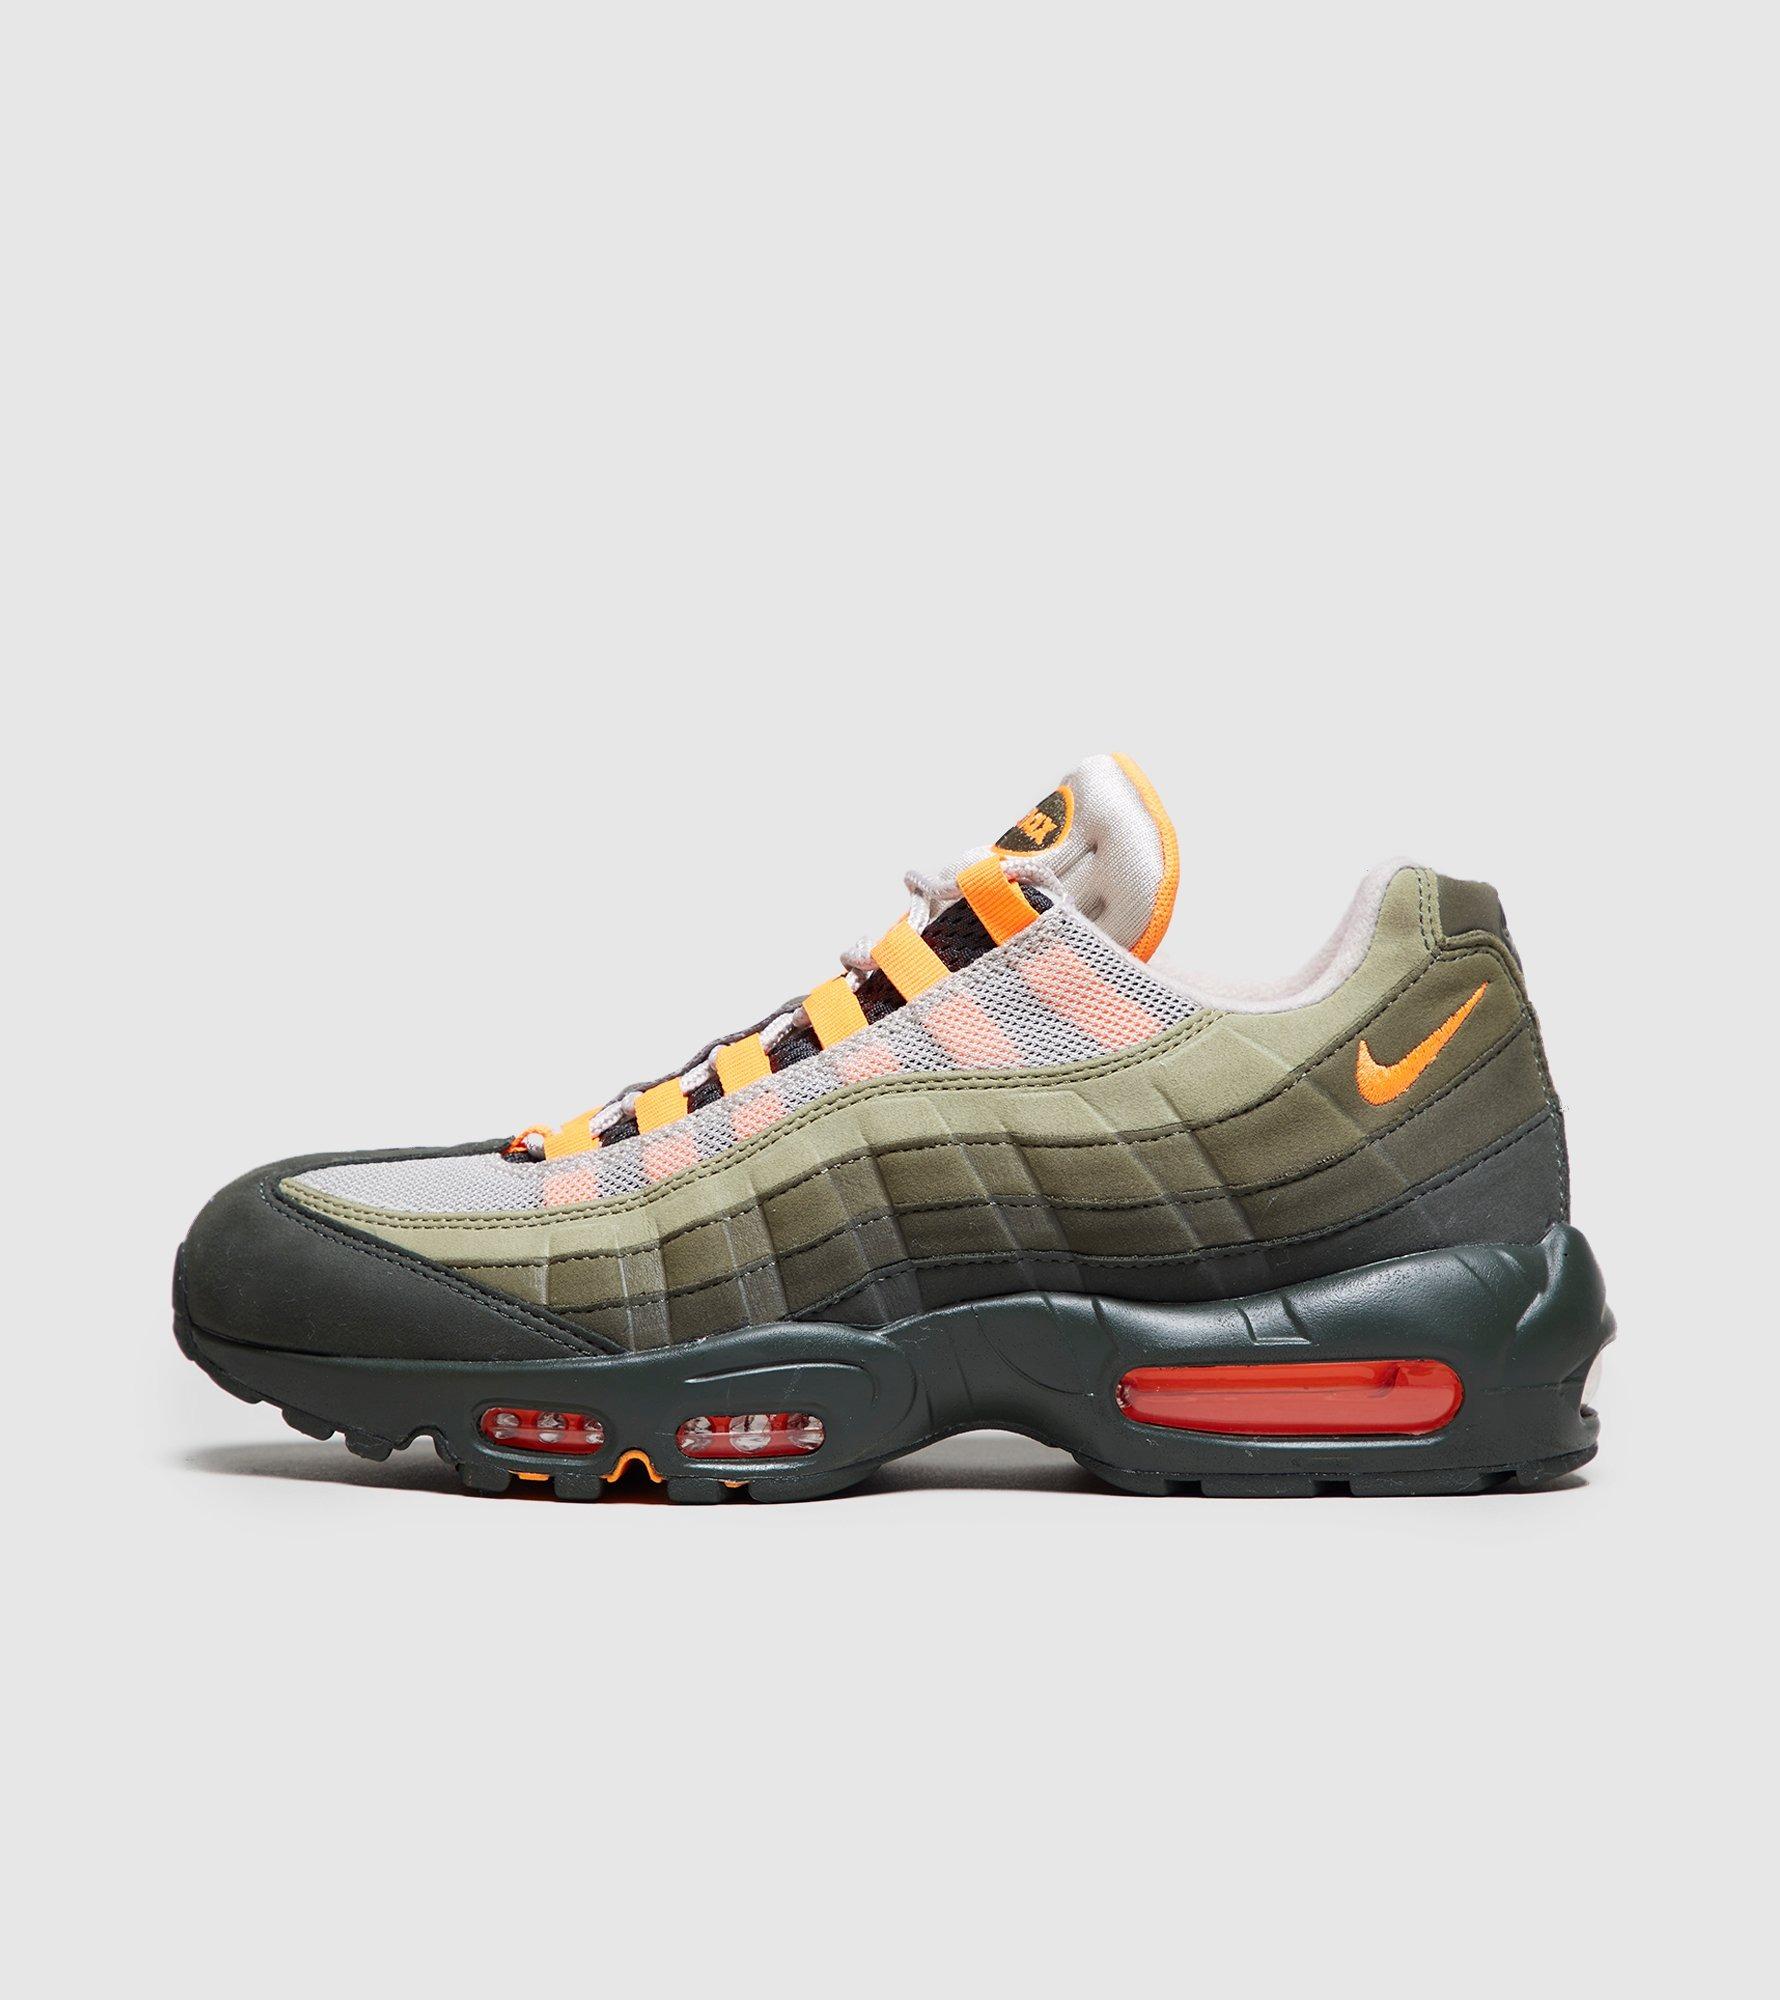 Nike Air Max 95 OG Dames | Size?